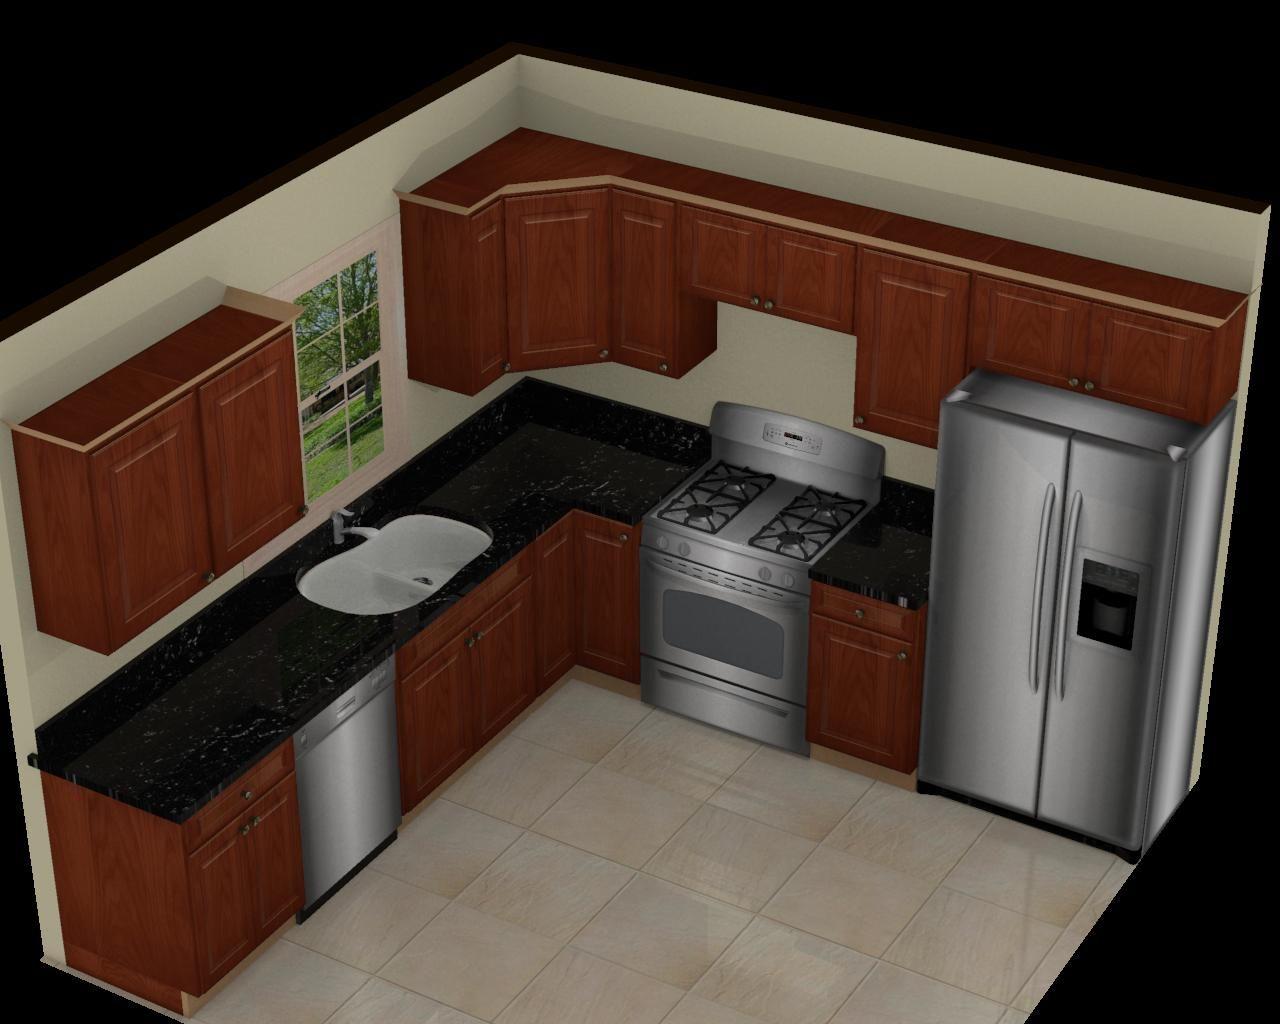 Brewster Kitchen And Bath Design Kitchen Plans Bathroom Plans Eastham Showroom Creative Des Kitchen Design Small Kitchen Layout Kitchen Cabinet Layout